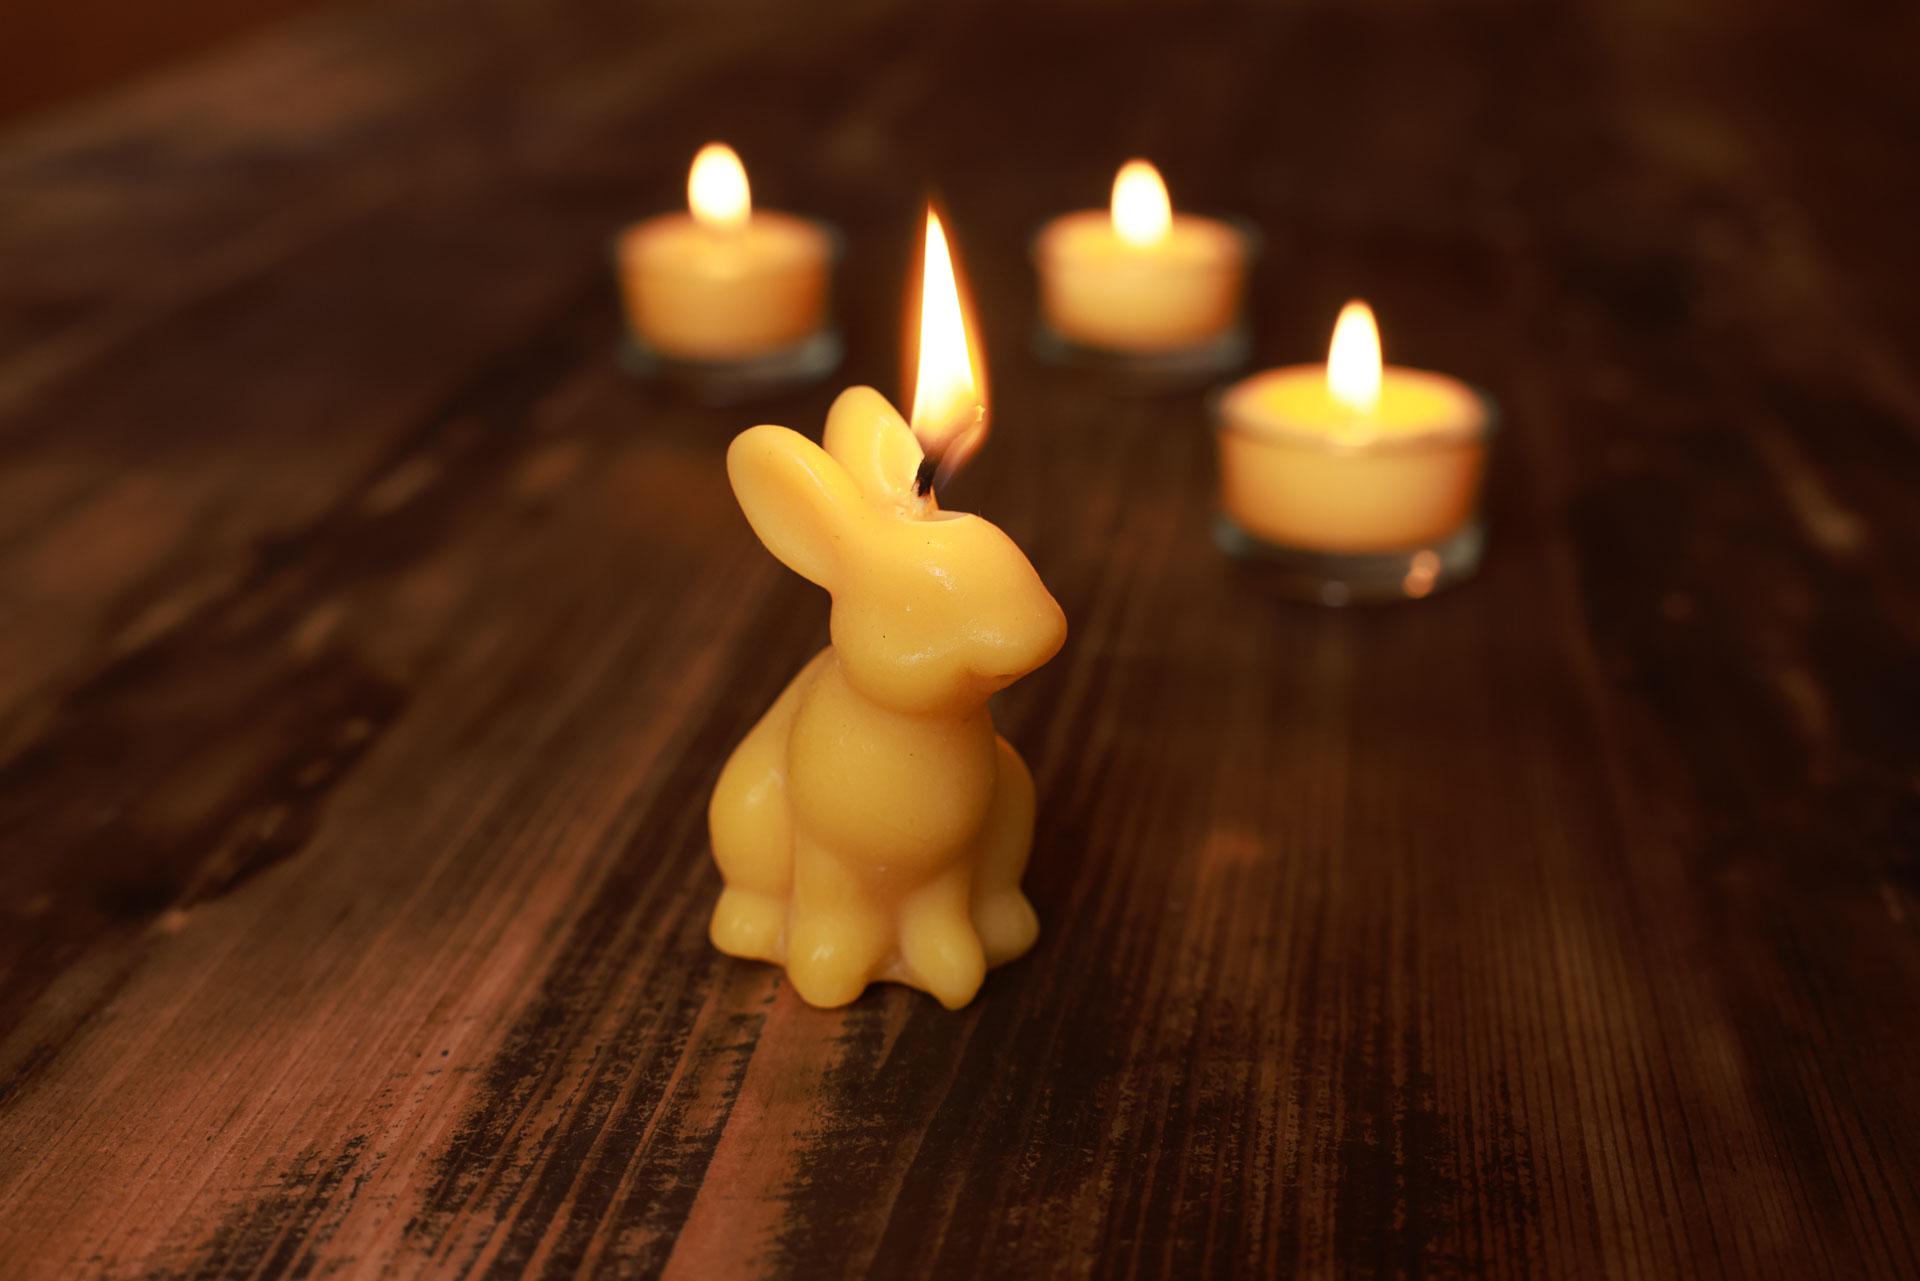 3x Kerze Hase Frodo (Höhe ca. 6,5cm) aus 100% Bienenwachs vom Imker